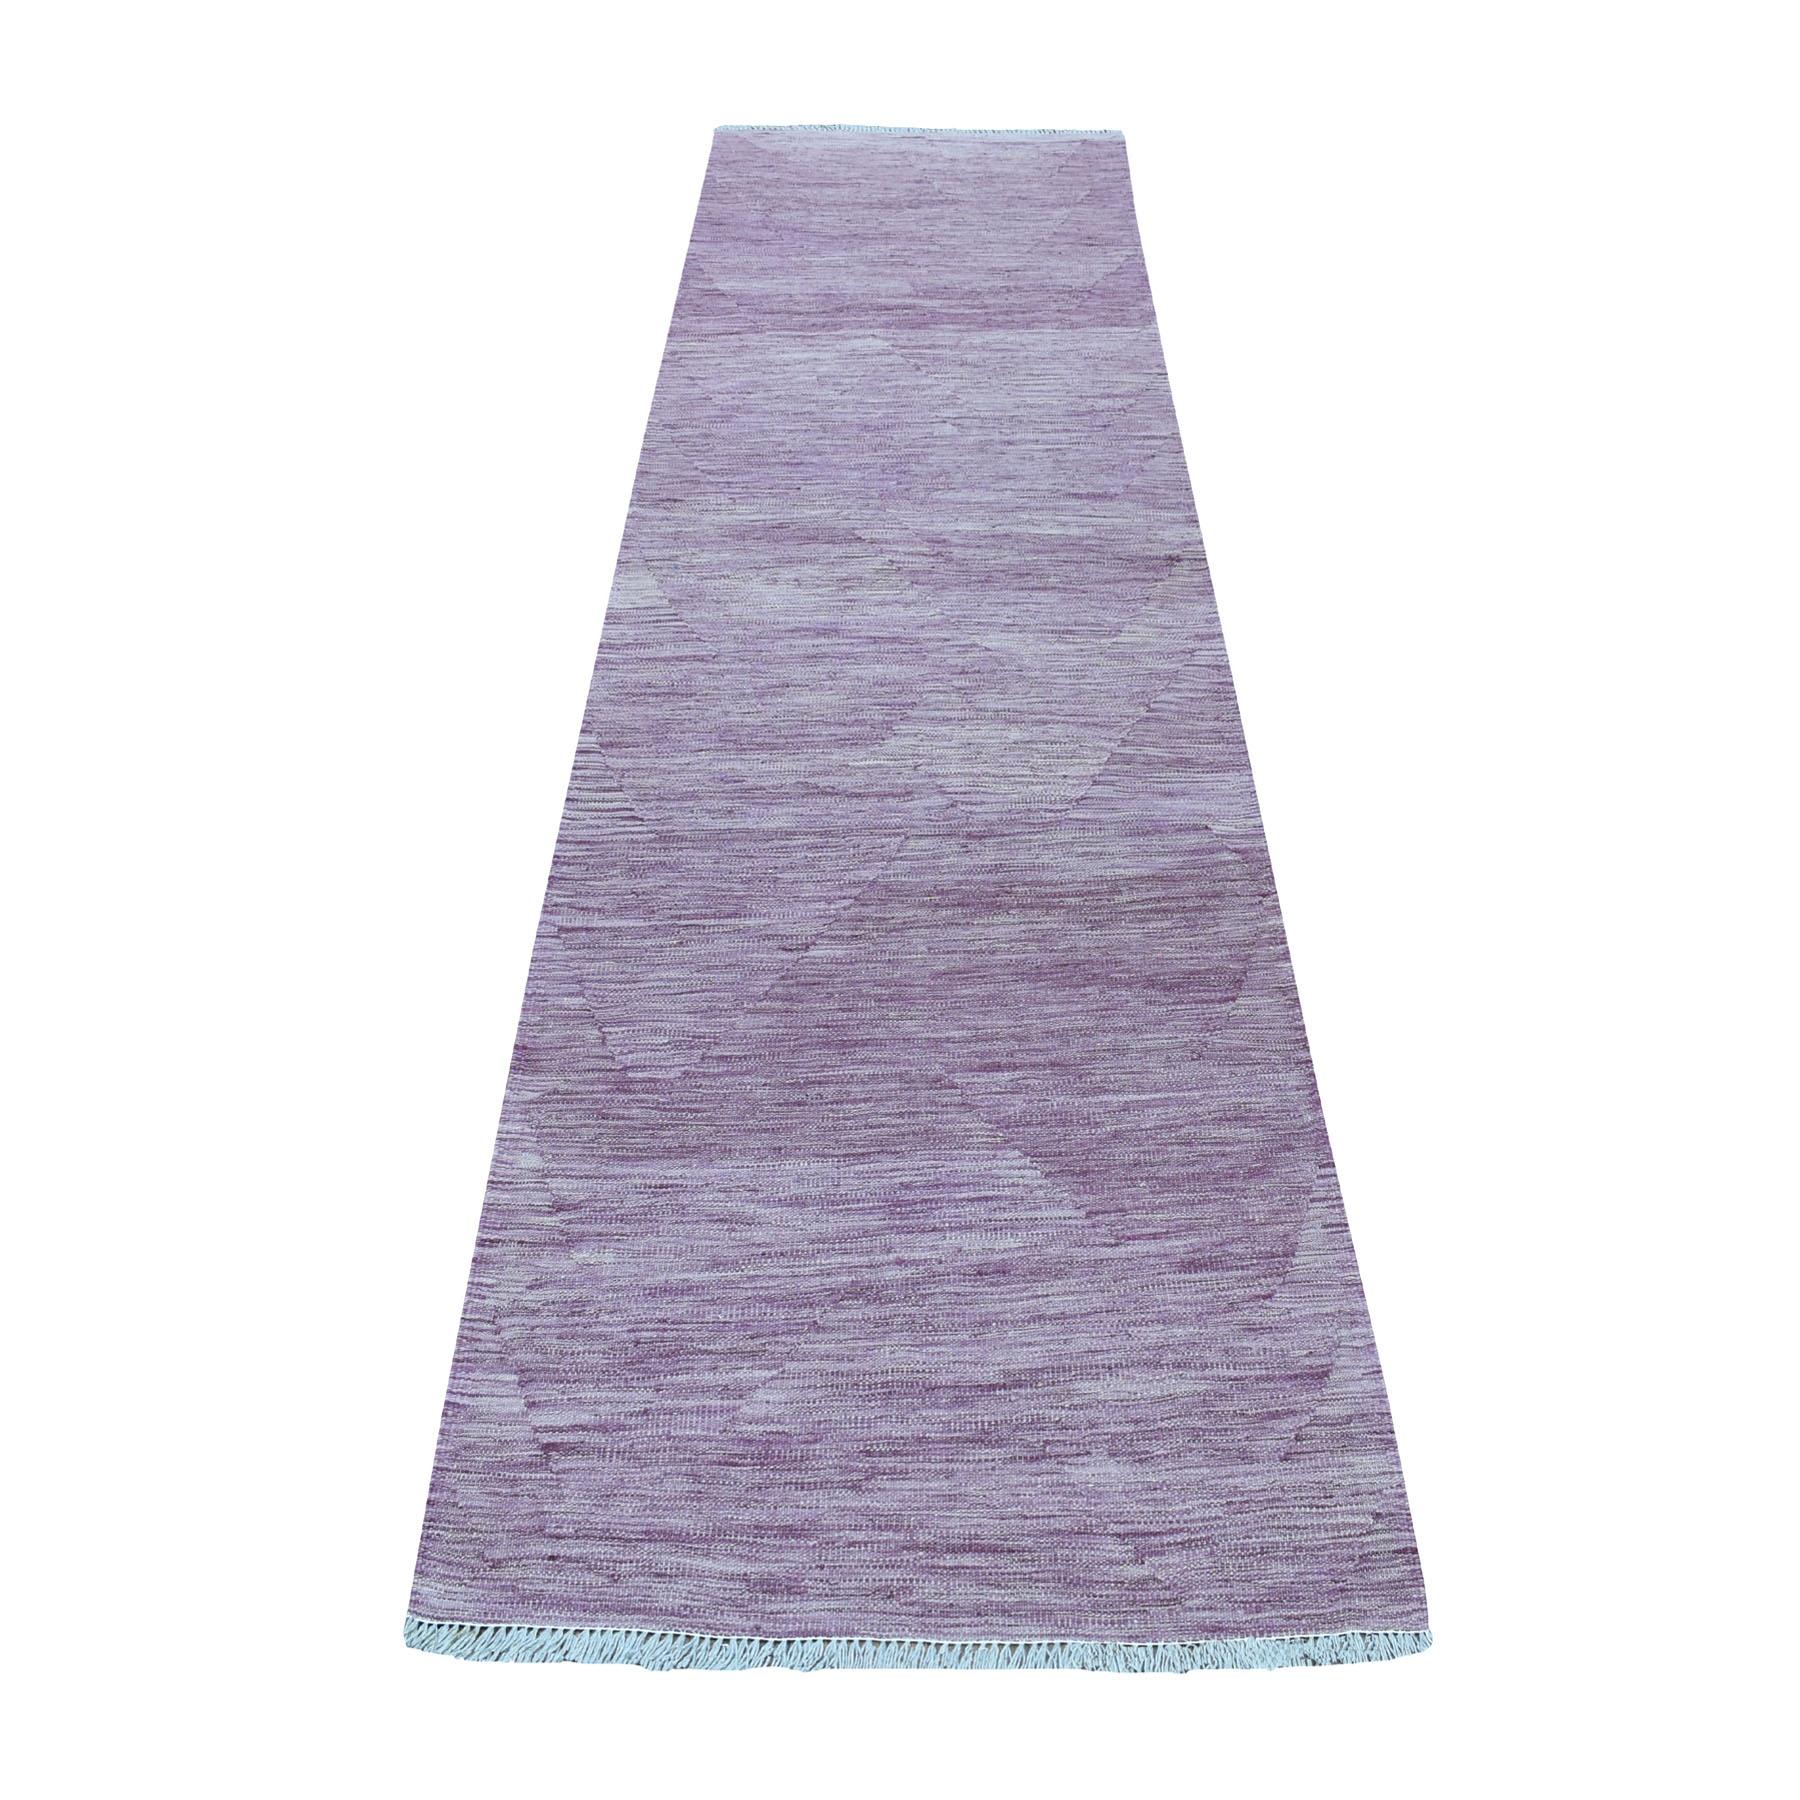 "3'x9'8"" Lavender shades Reversible Kilim Pure Wool Hand Woven Runner Oriental Rug"